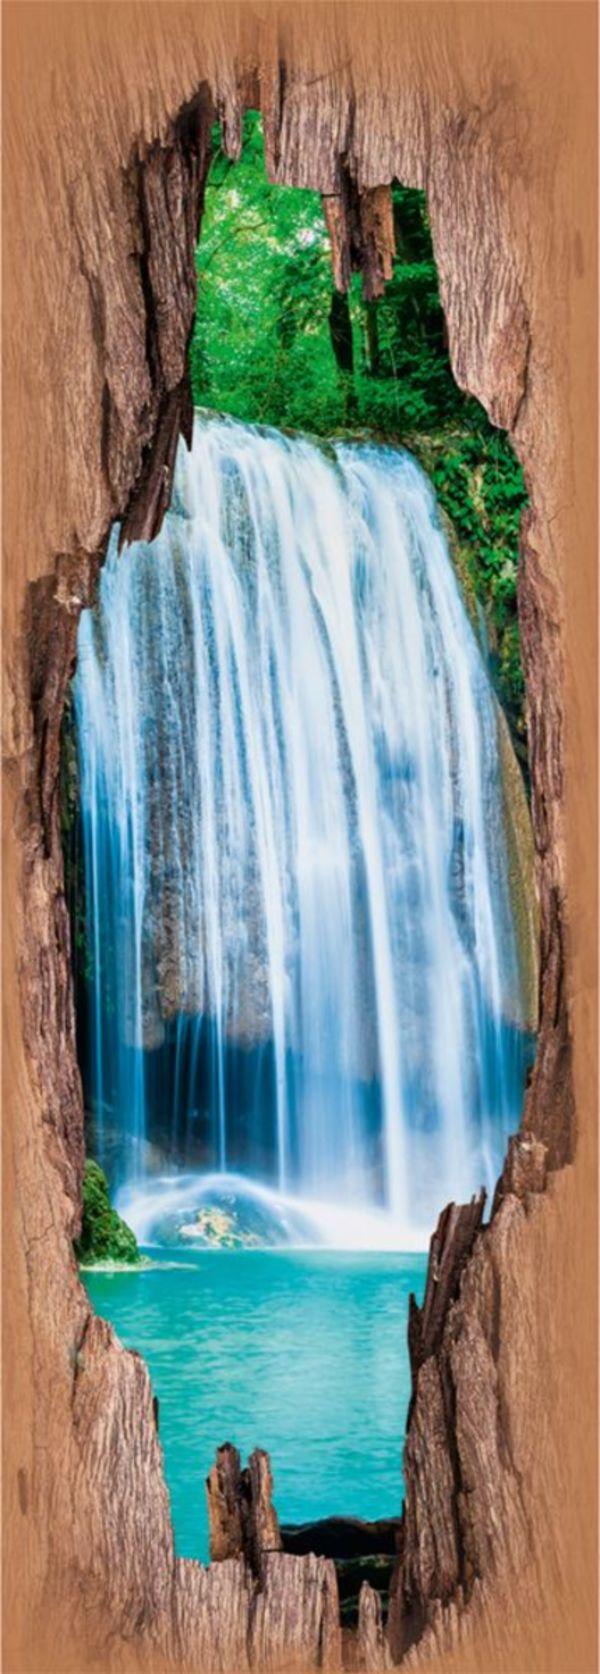 EASYmaxx Türsticker 3D Wasserfälle 50x140cm mehrfarbig